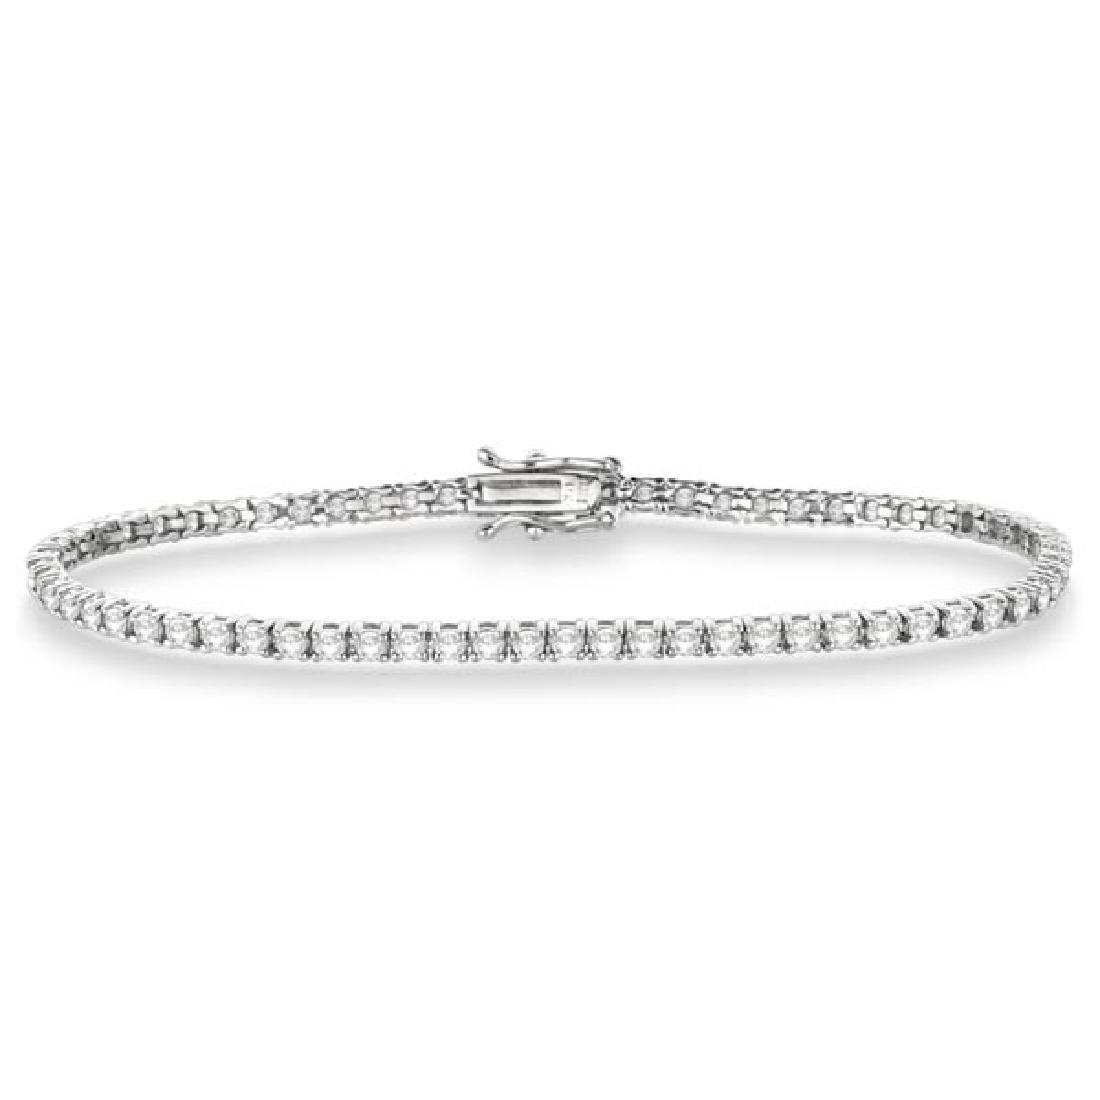 Eternity Diamond Tennis Bracelet 14k White Gold (3.51ct